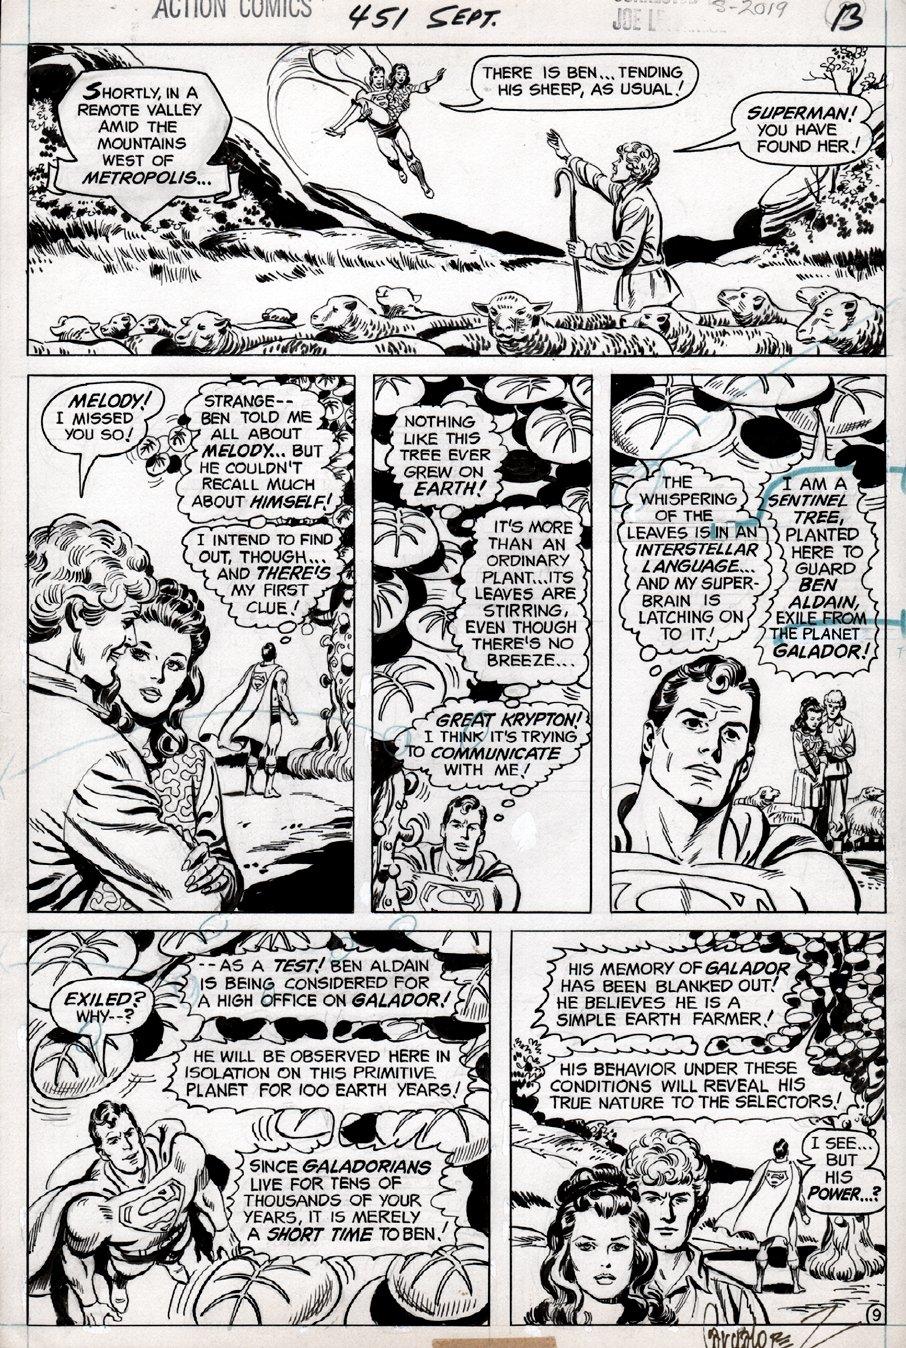 Action Comics #451 p 9 (1975)